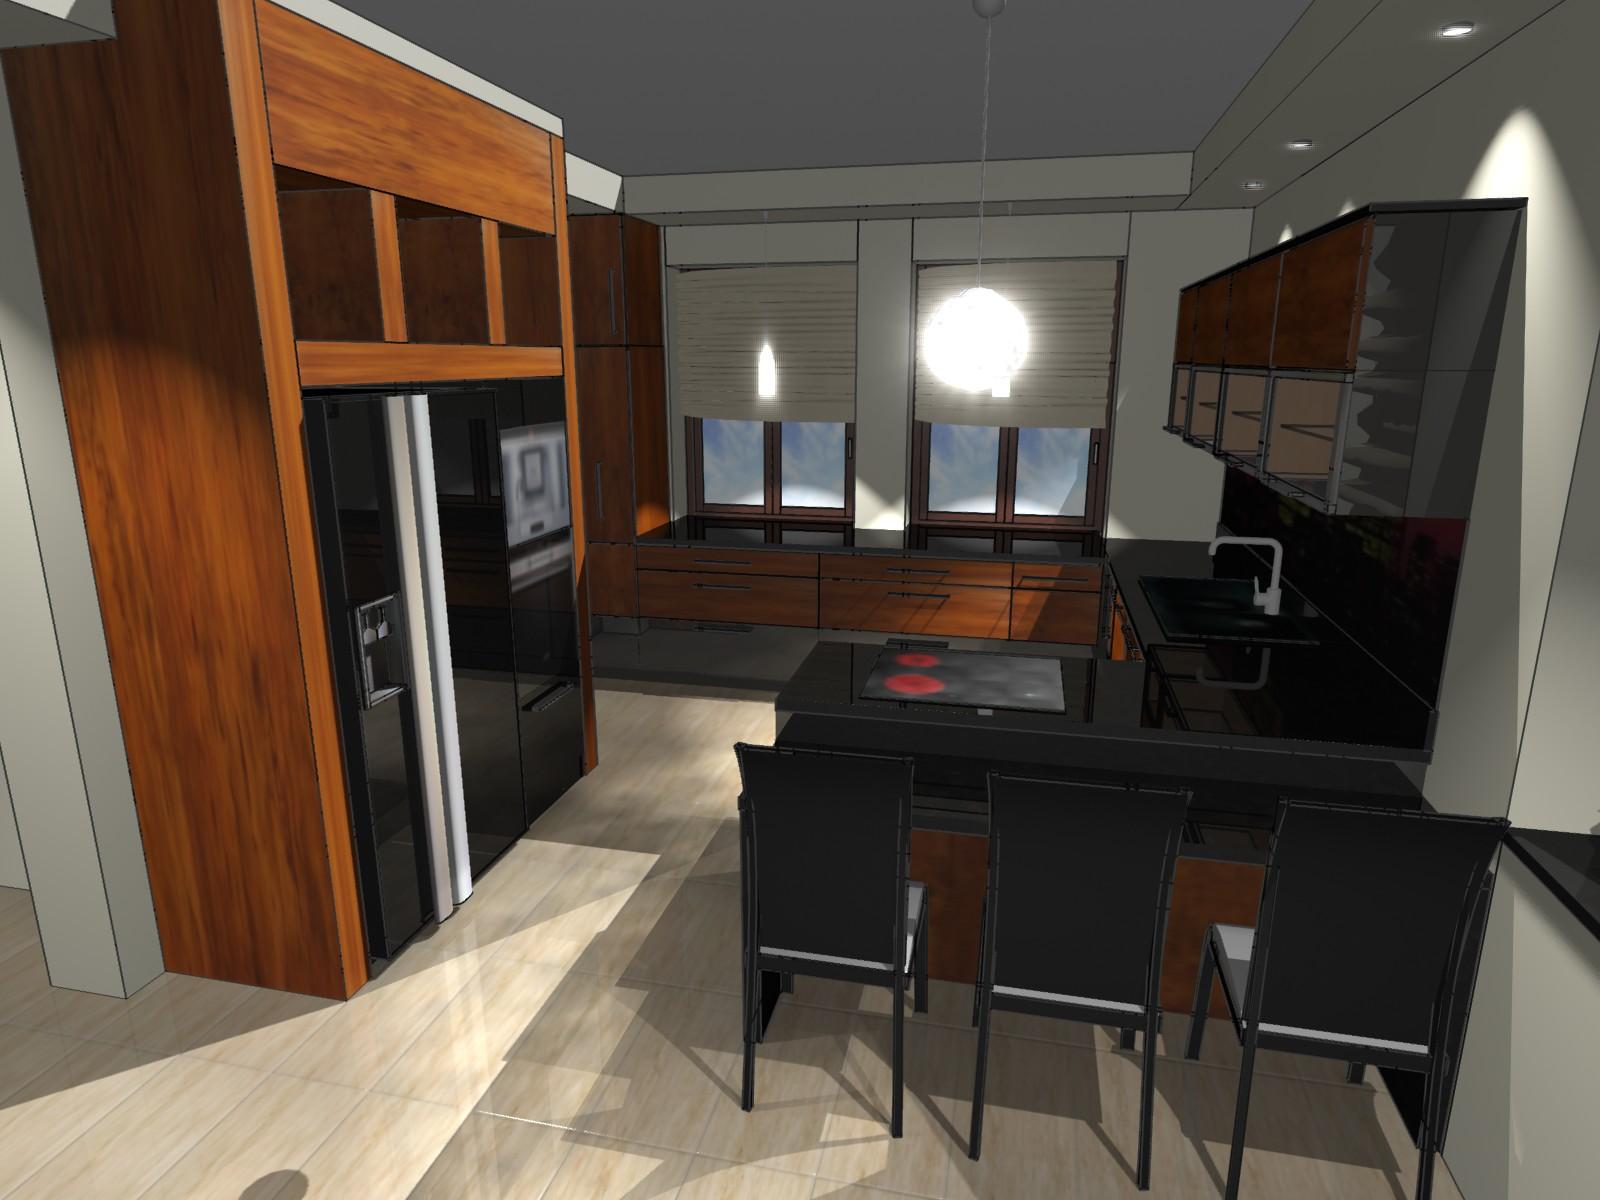 Kuchnia nowoczesna #1  Emka Studio -> Kuchnia Fornir Palisander